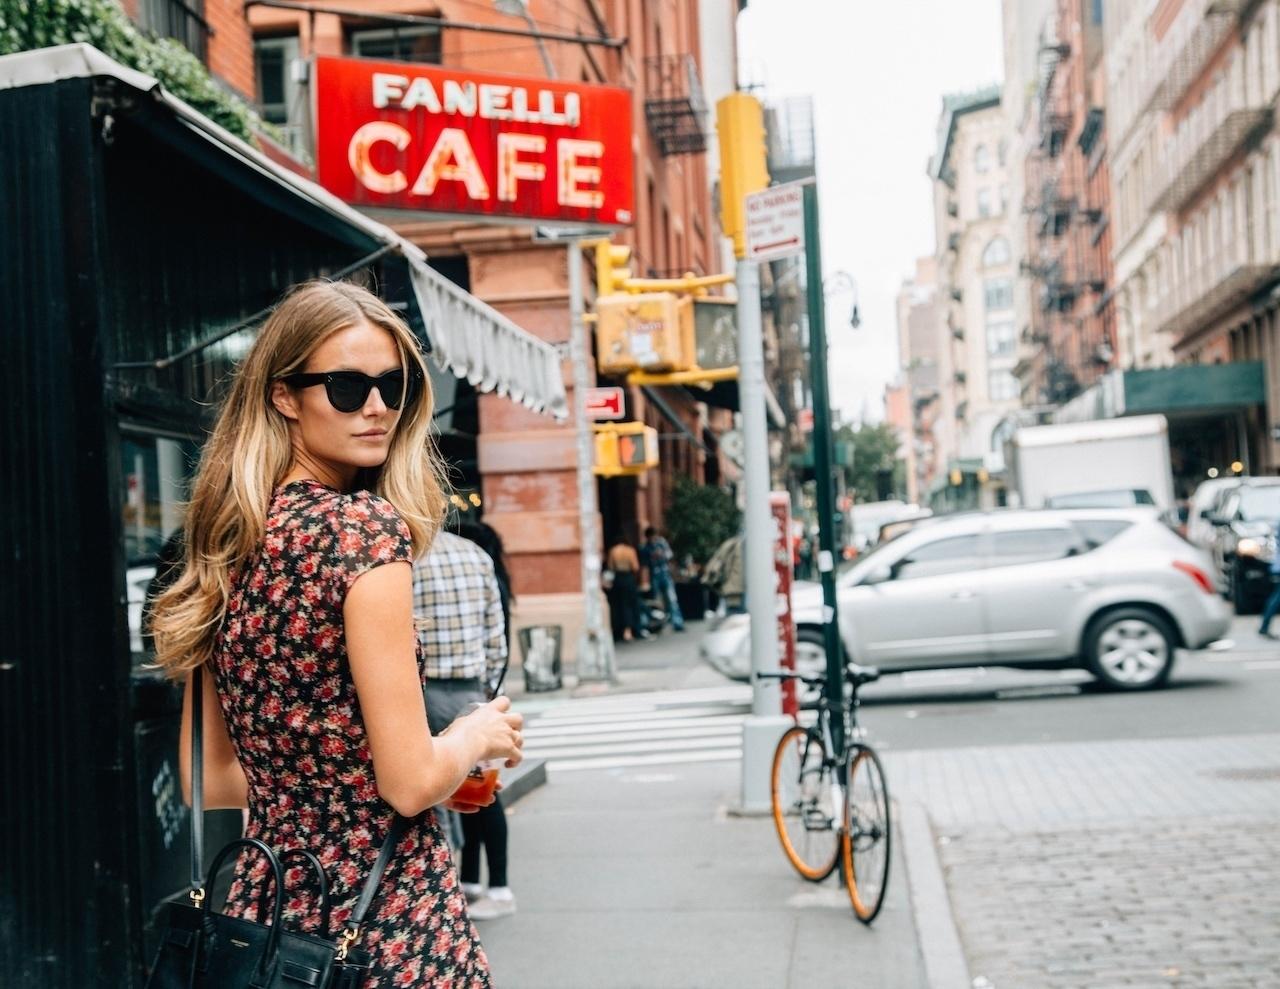 Fanelli Cafe Location Shot